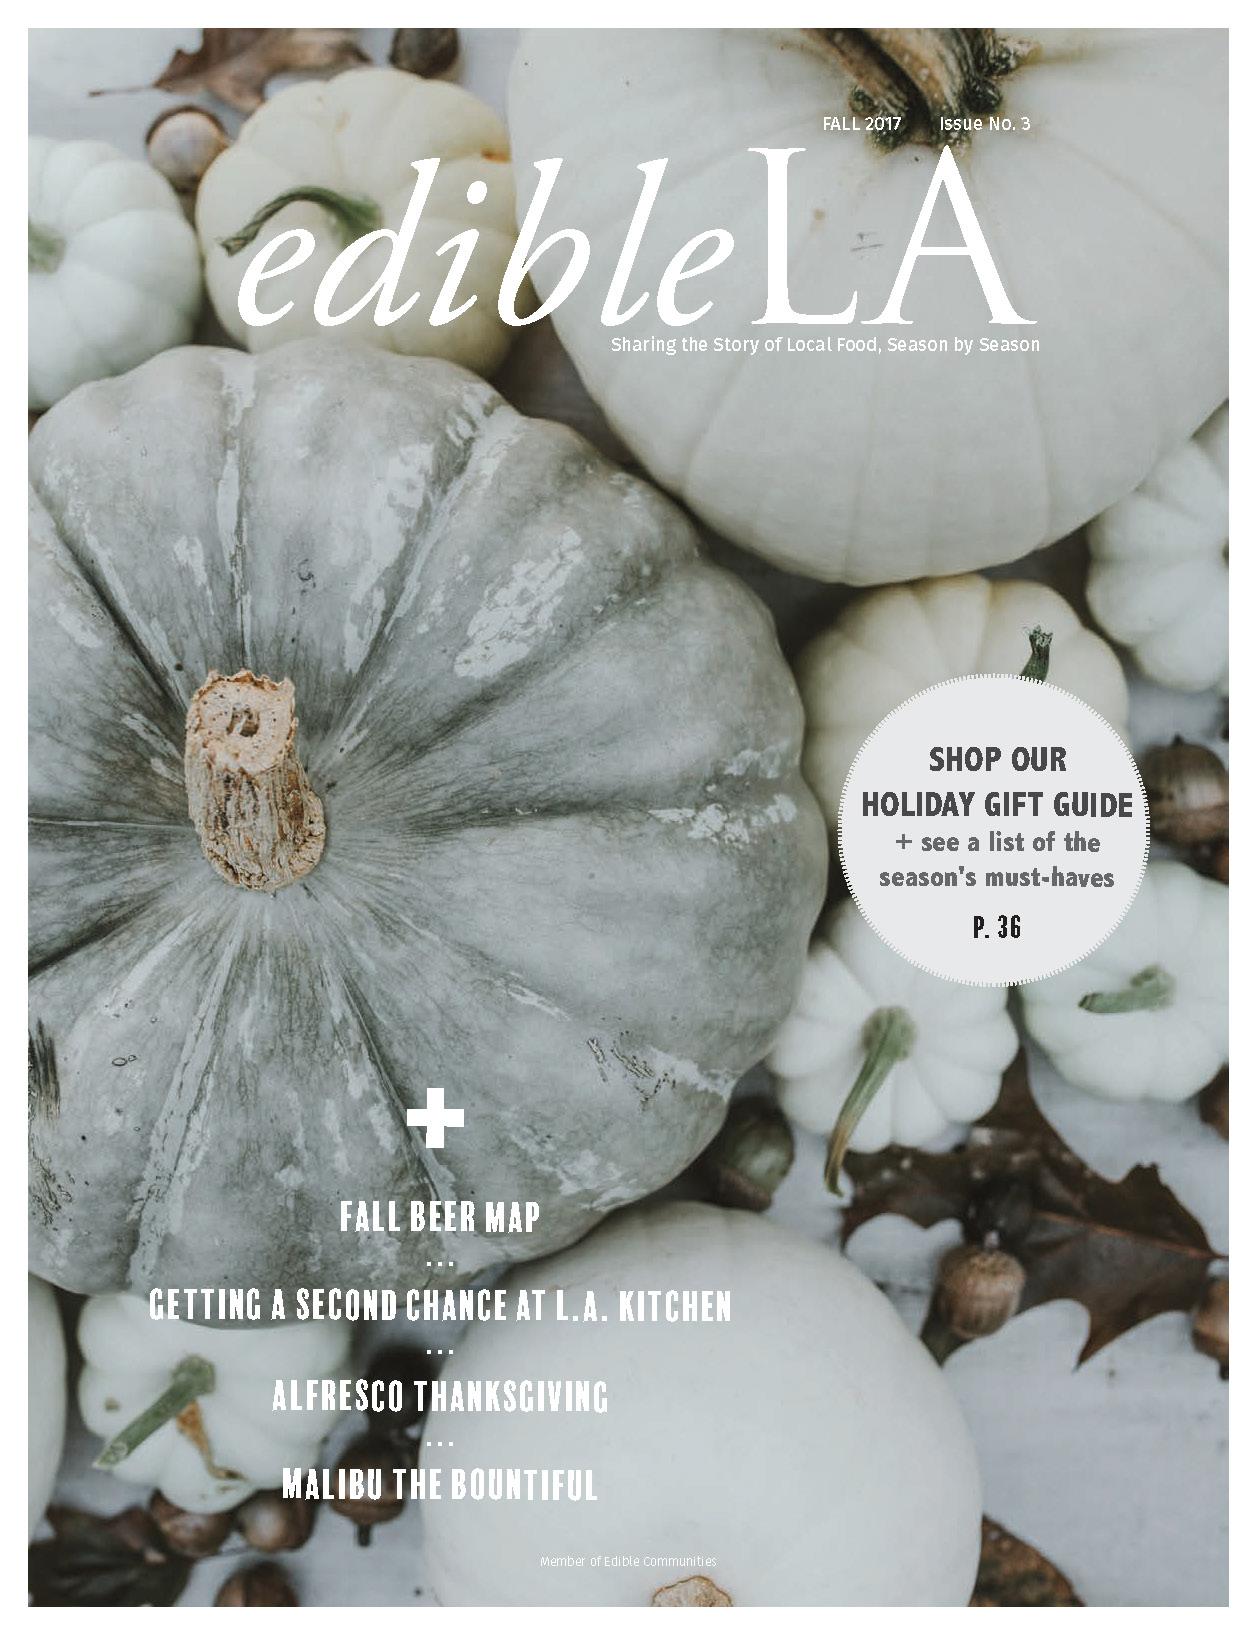 Edible_LA_Fall_2017_Malibu_Page_1.jpg